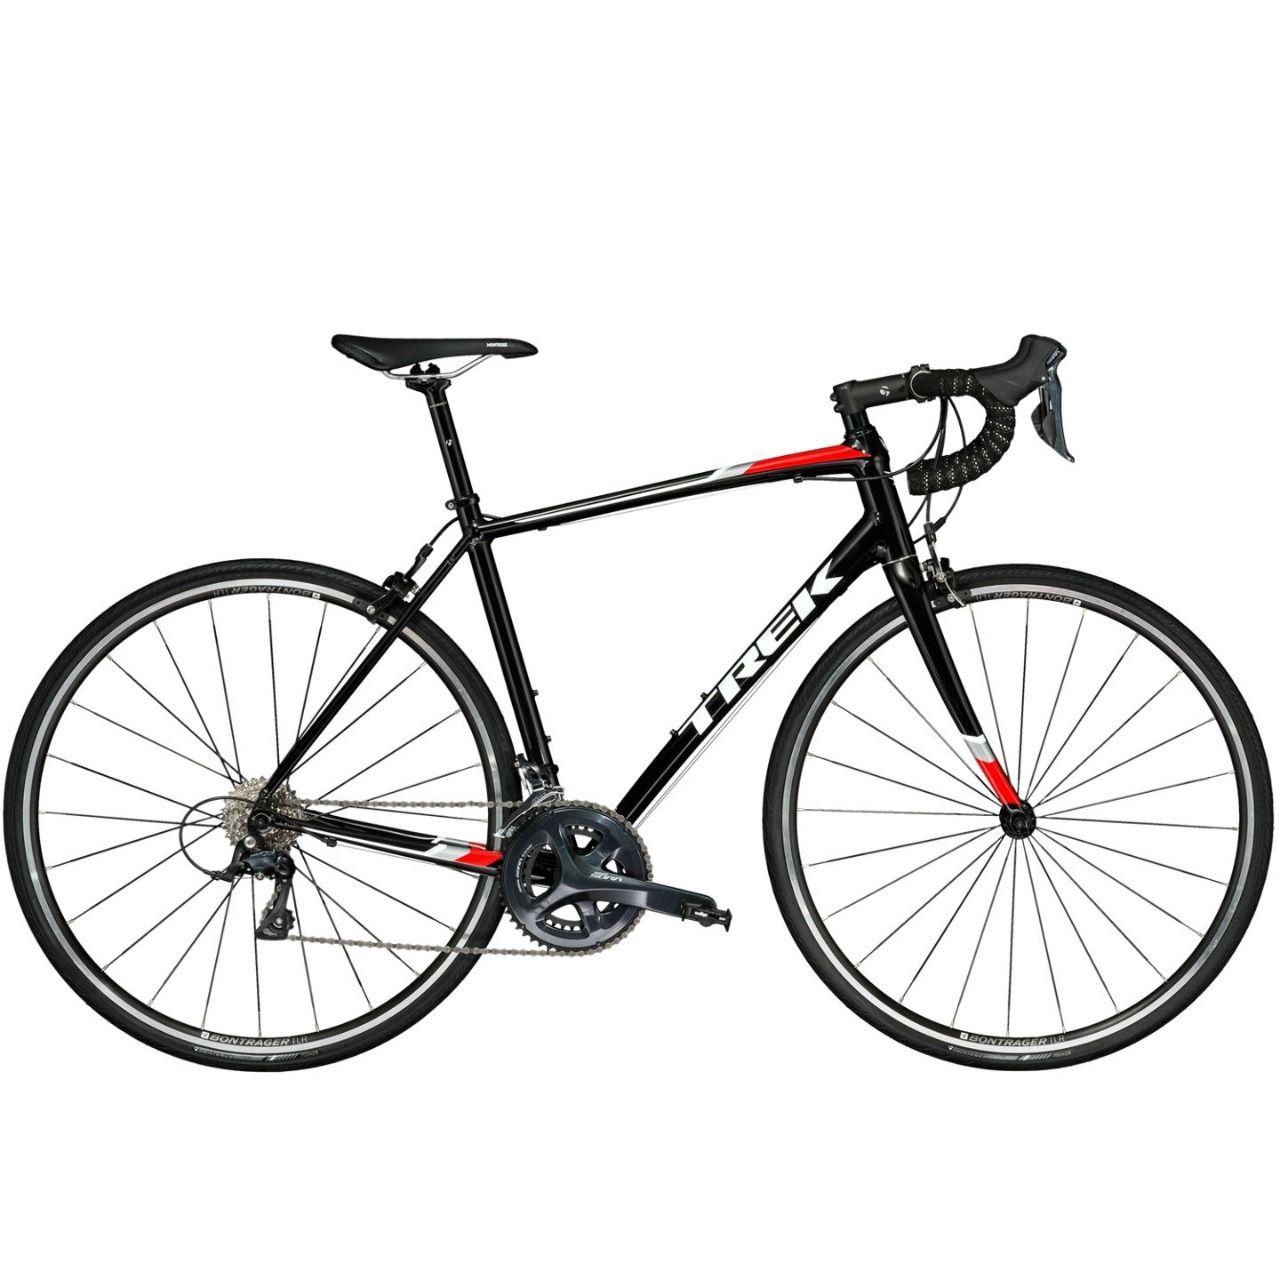 Bicicleta Trek Domane AL3 - 2018 - R$ 5.999,00